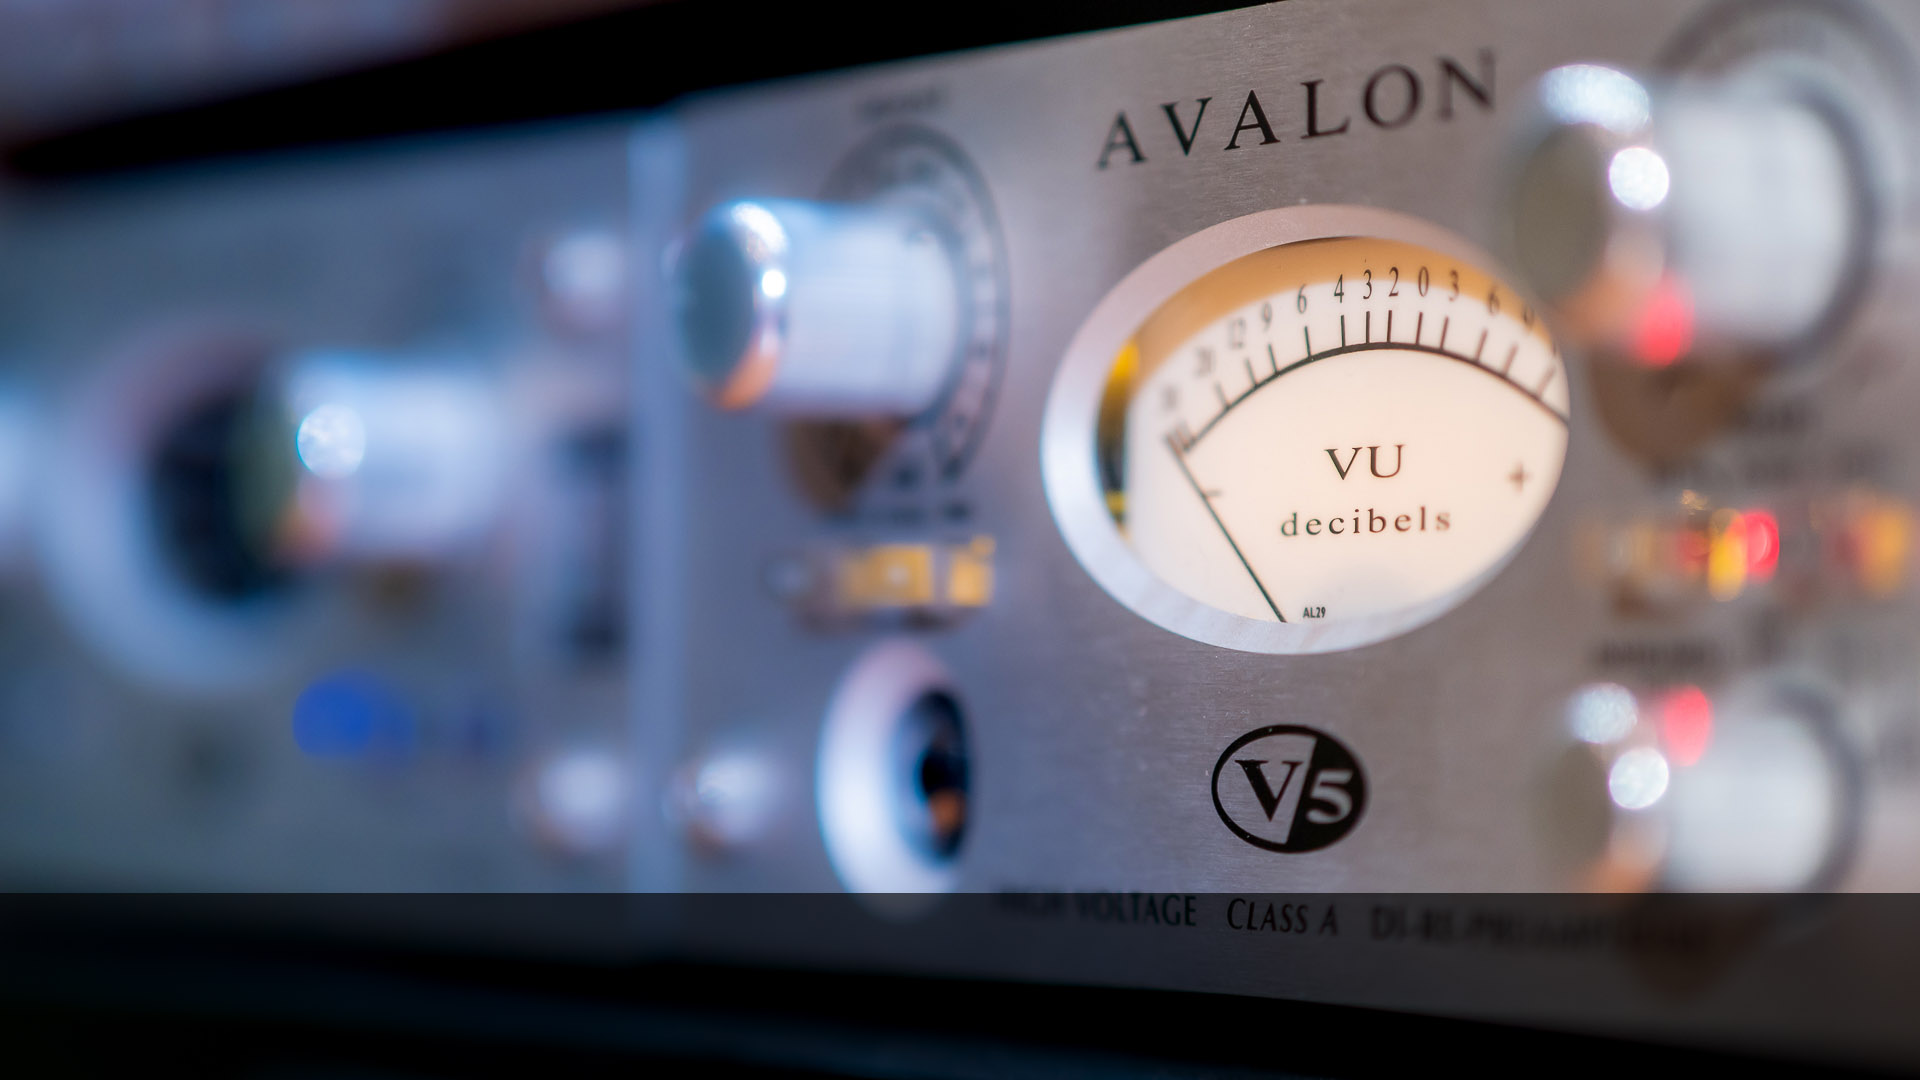 Tonstudio Avalon © Volker Lesch - Alpenland Fotografie